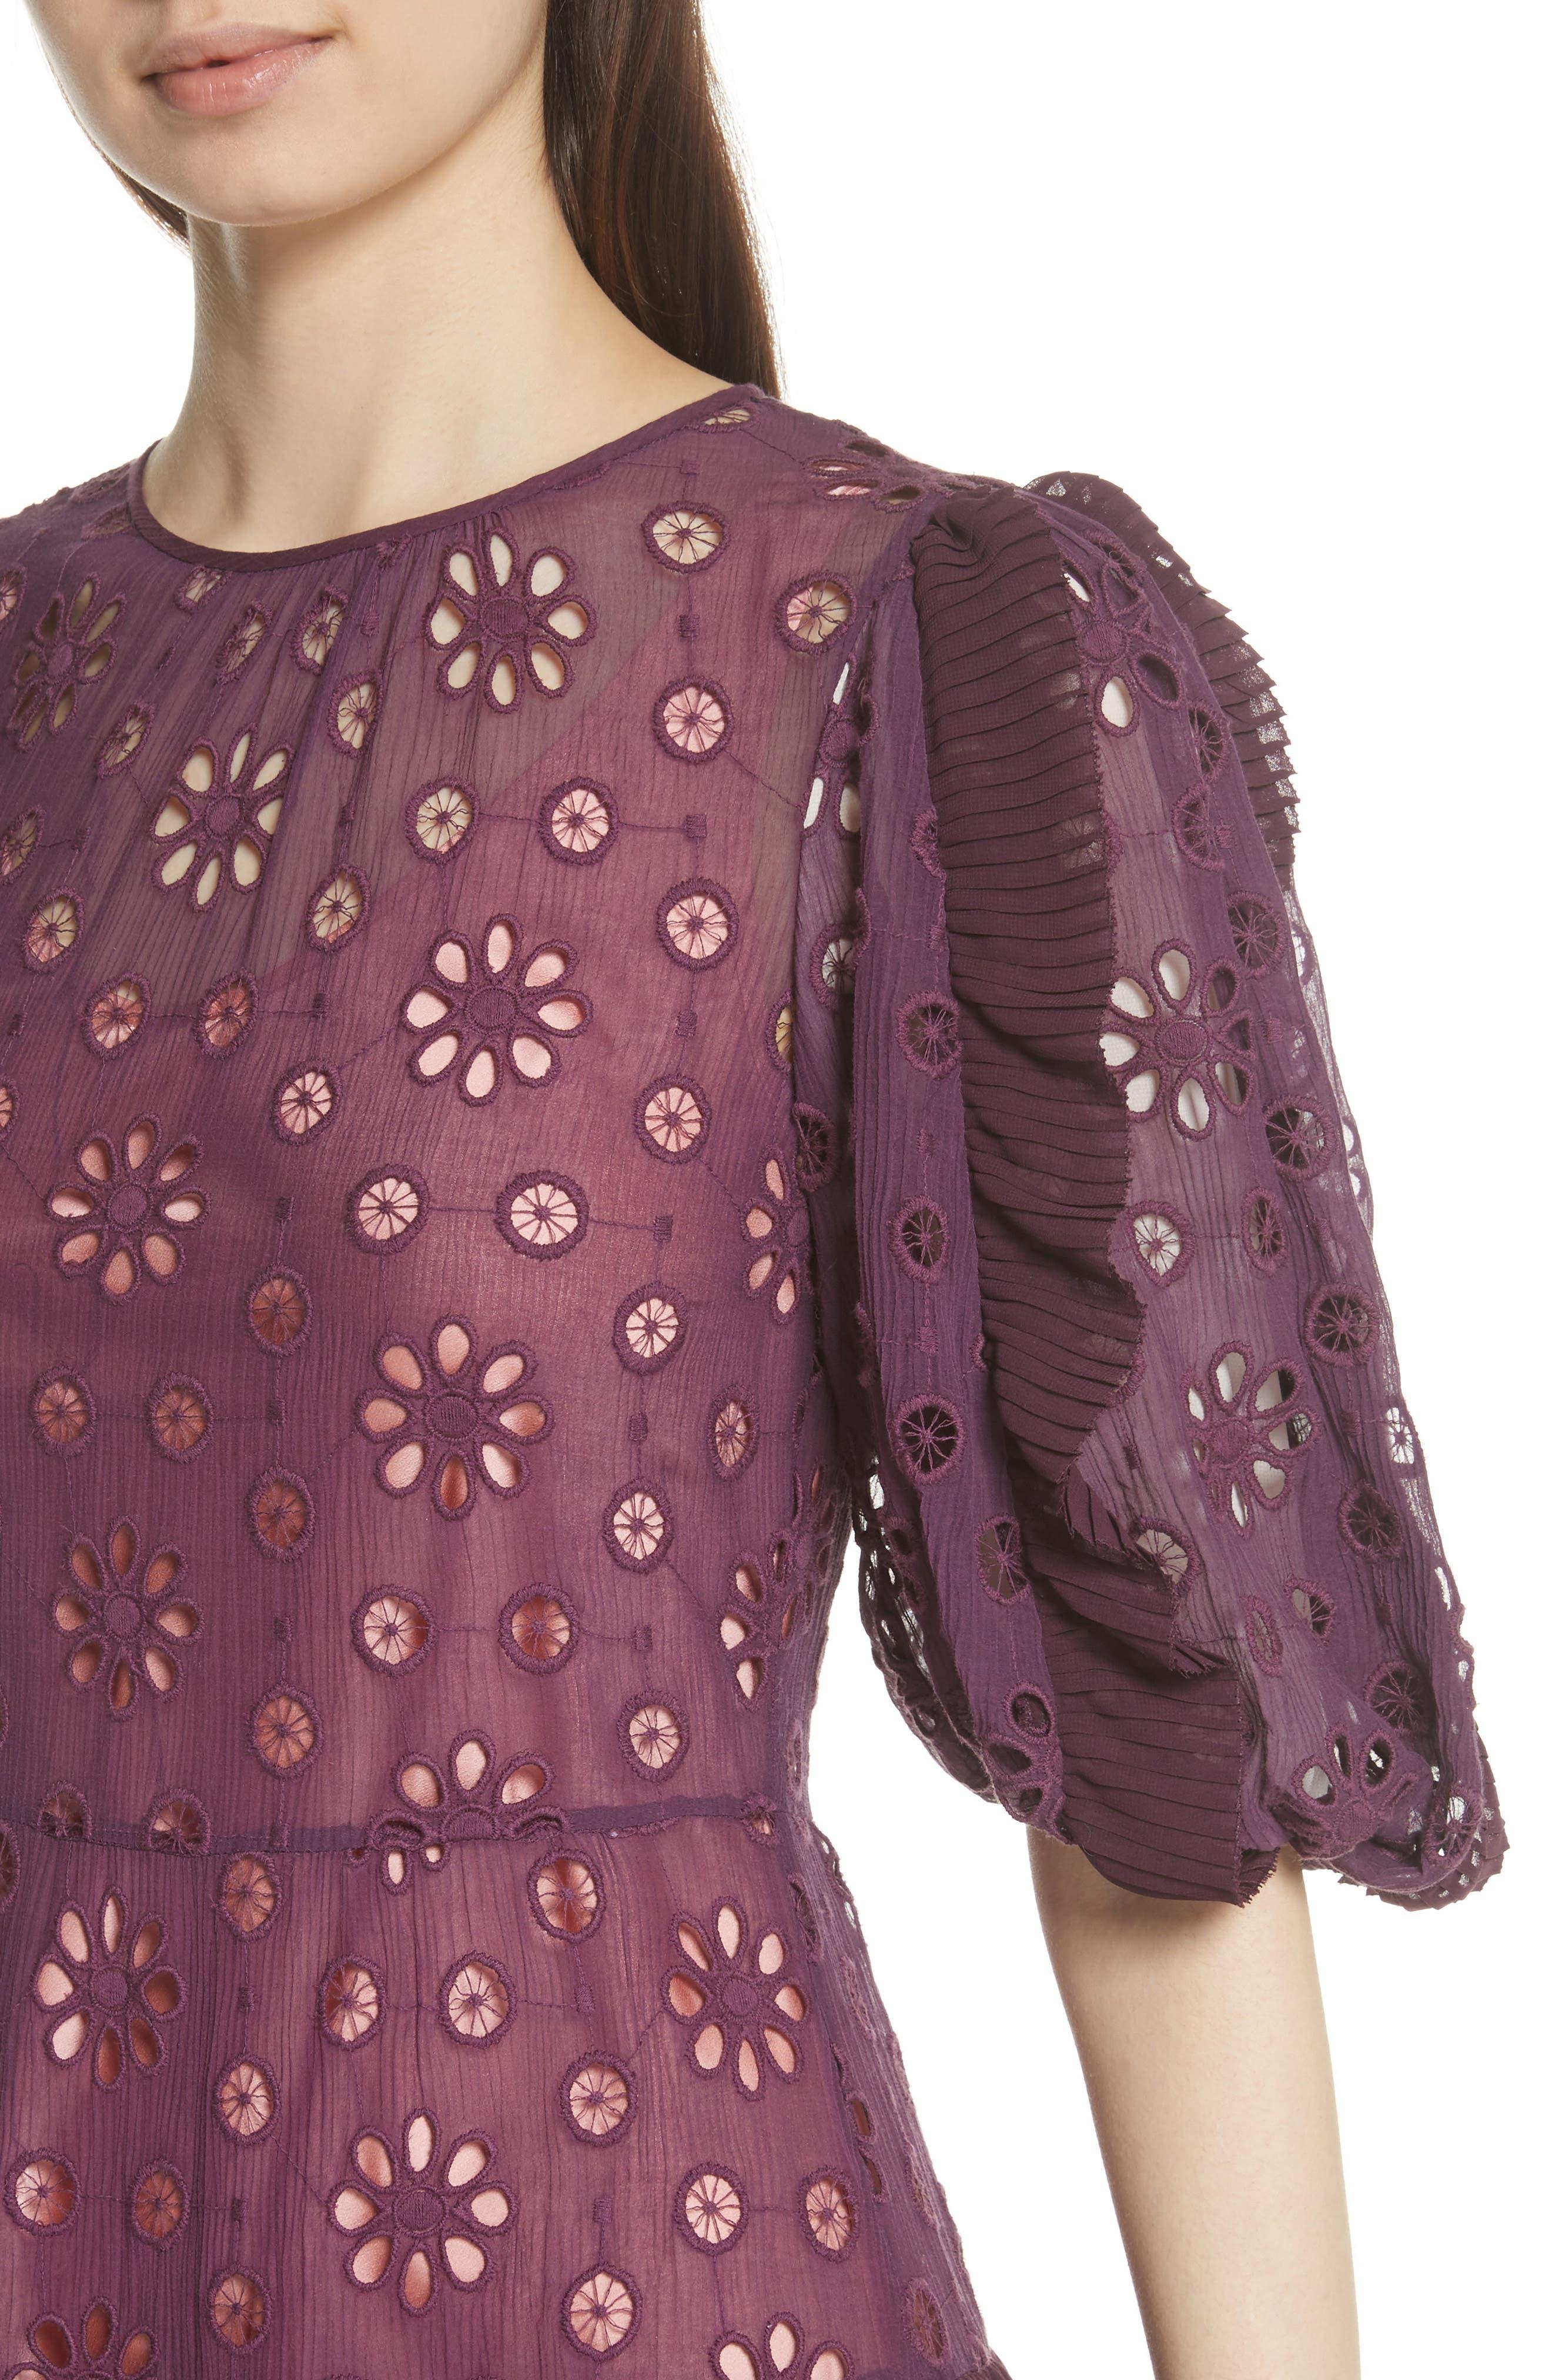 Pinwheel Eyelet Dress,                             Alternate thumbnail 4, color,                             Plum